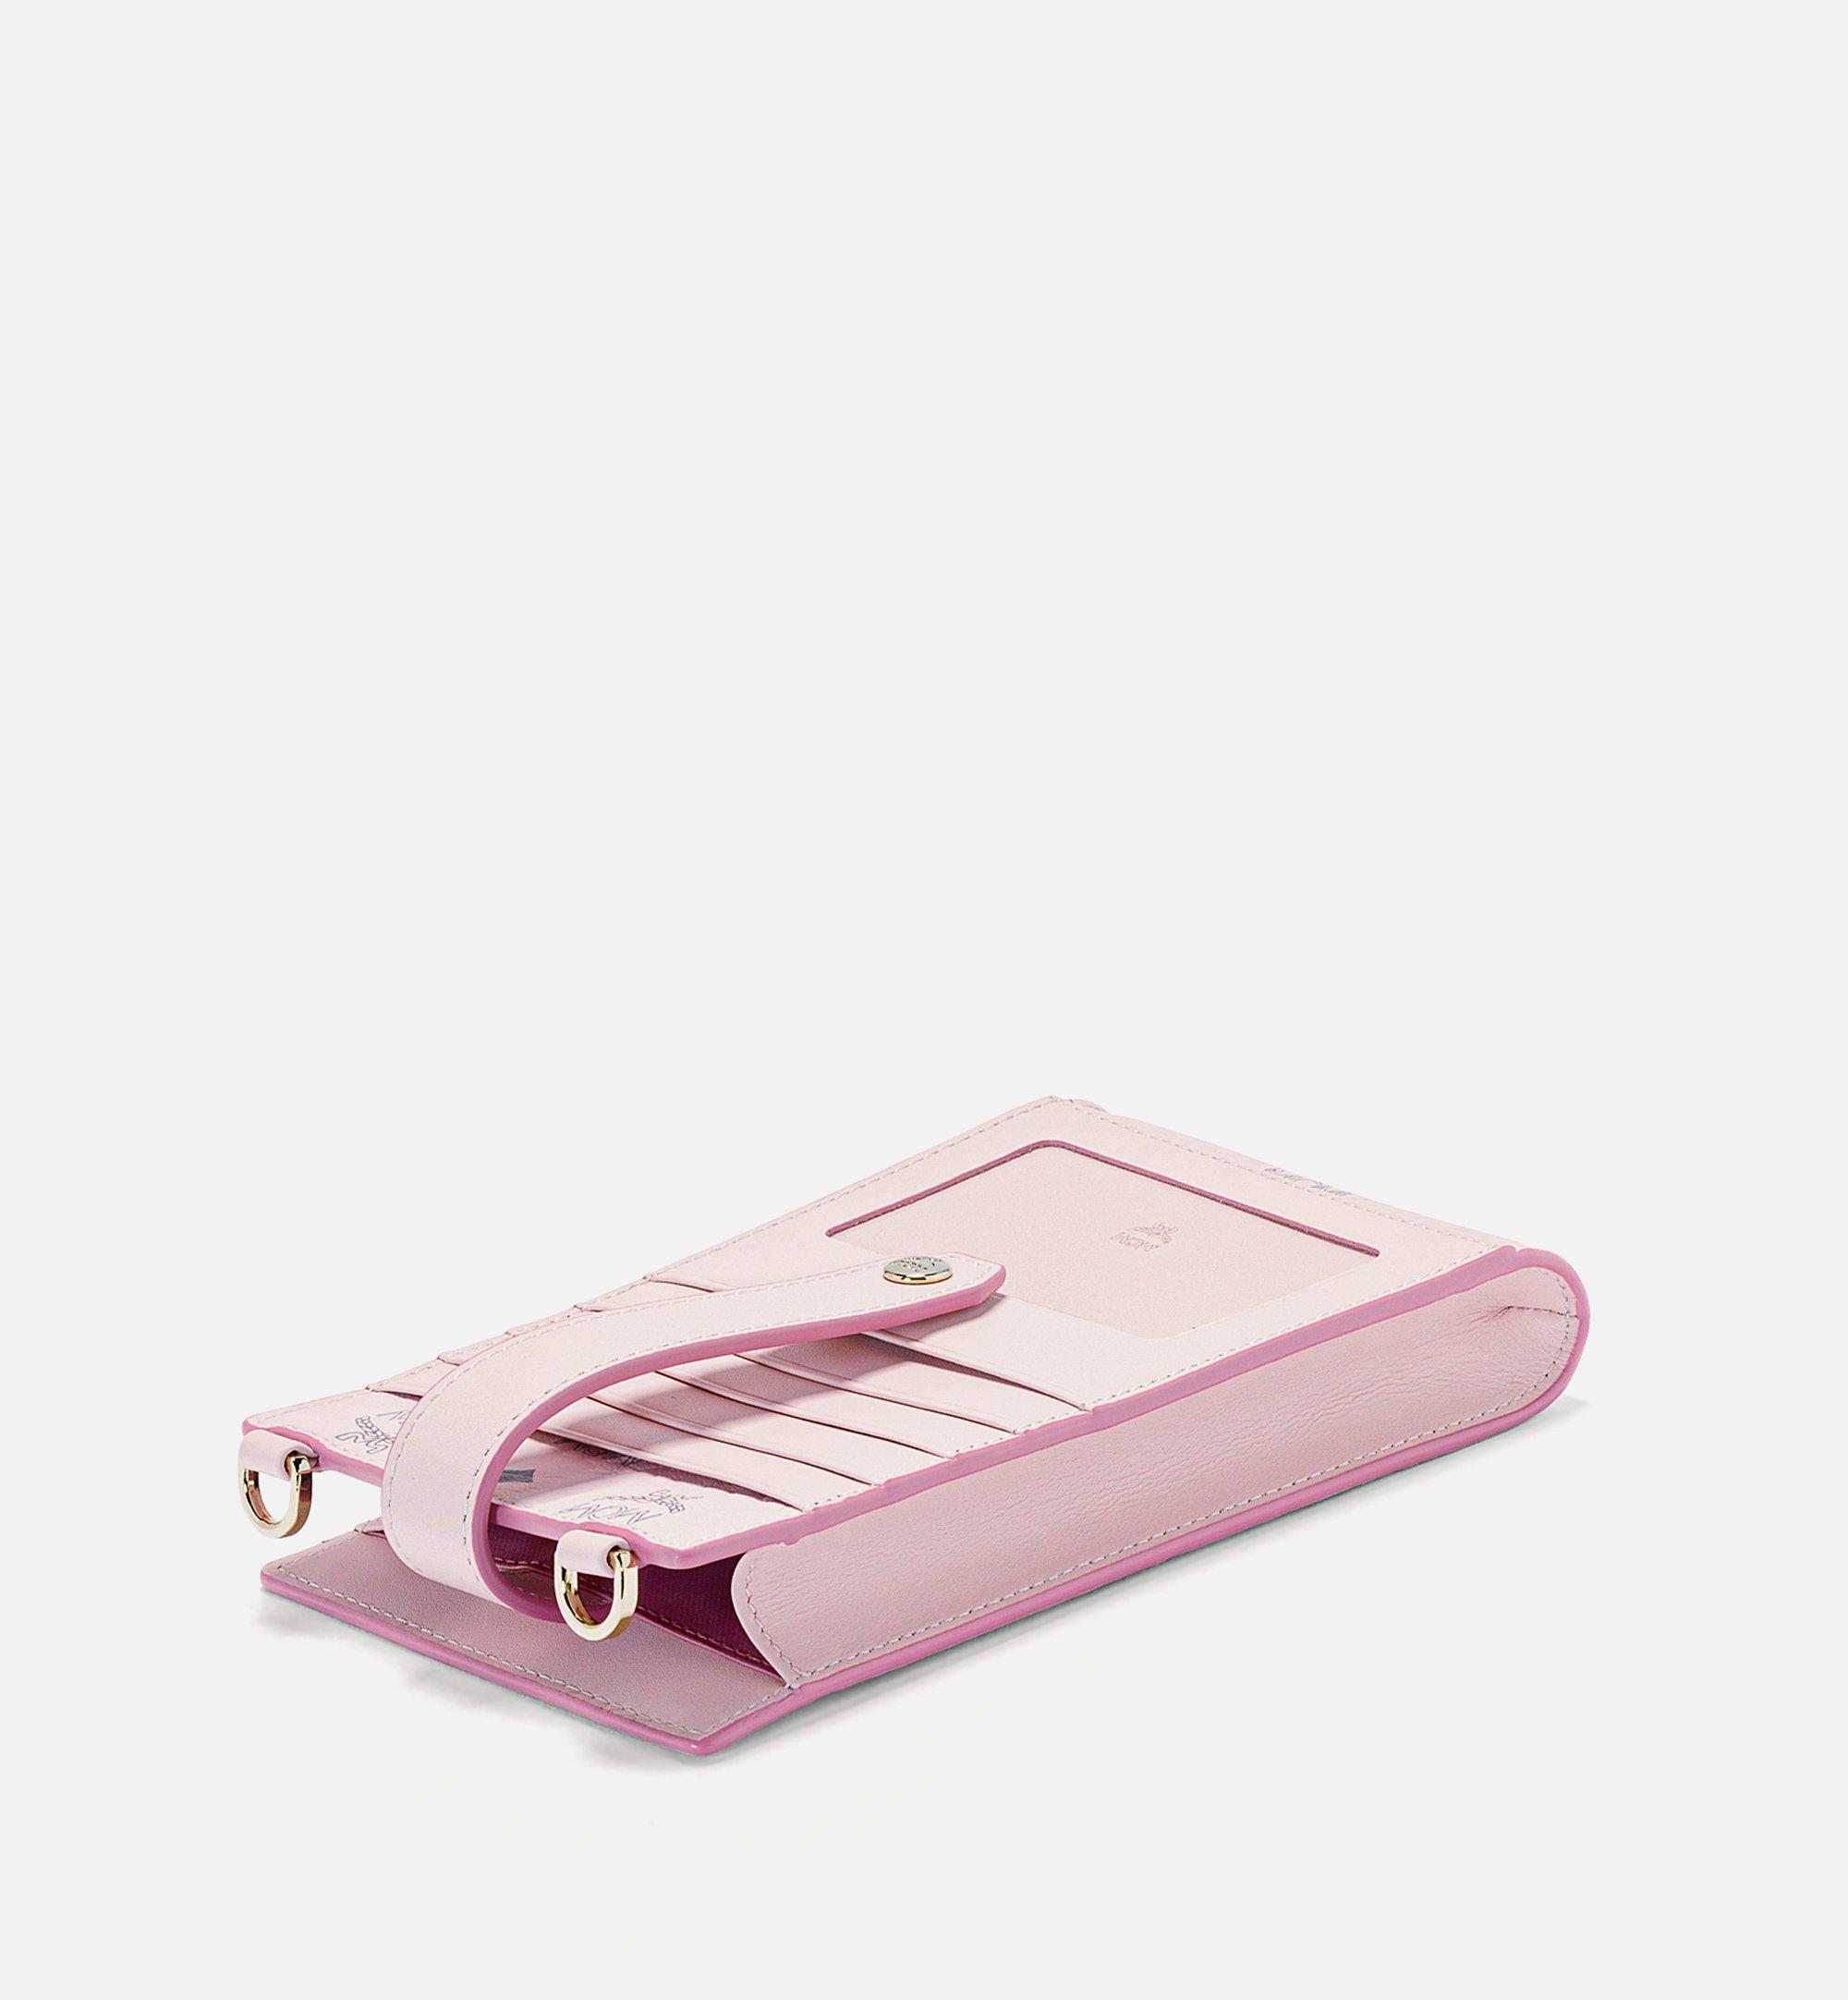 MCM Visetos Original 系列多功能手機保護套 Pink MXZBSVI01QH001 更多視圖 1